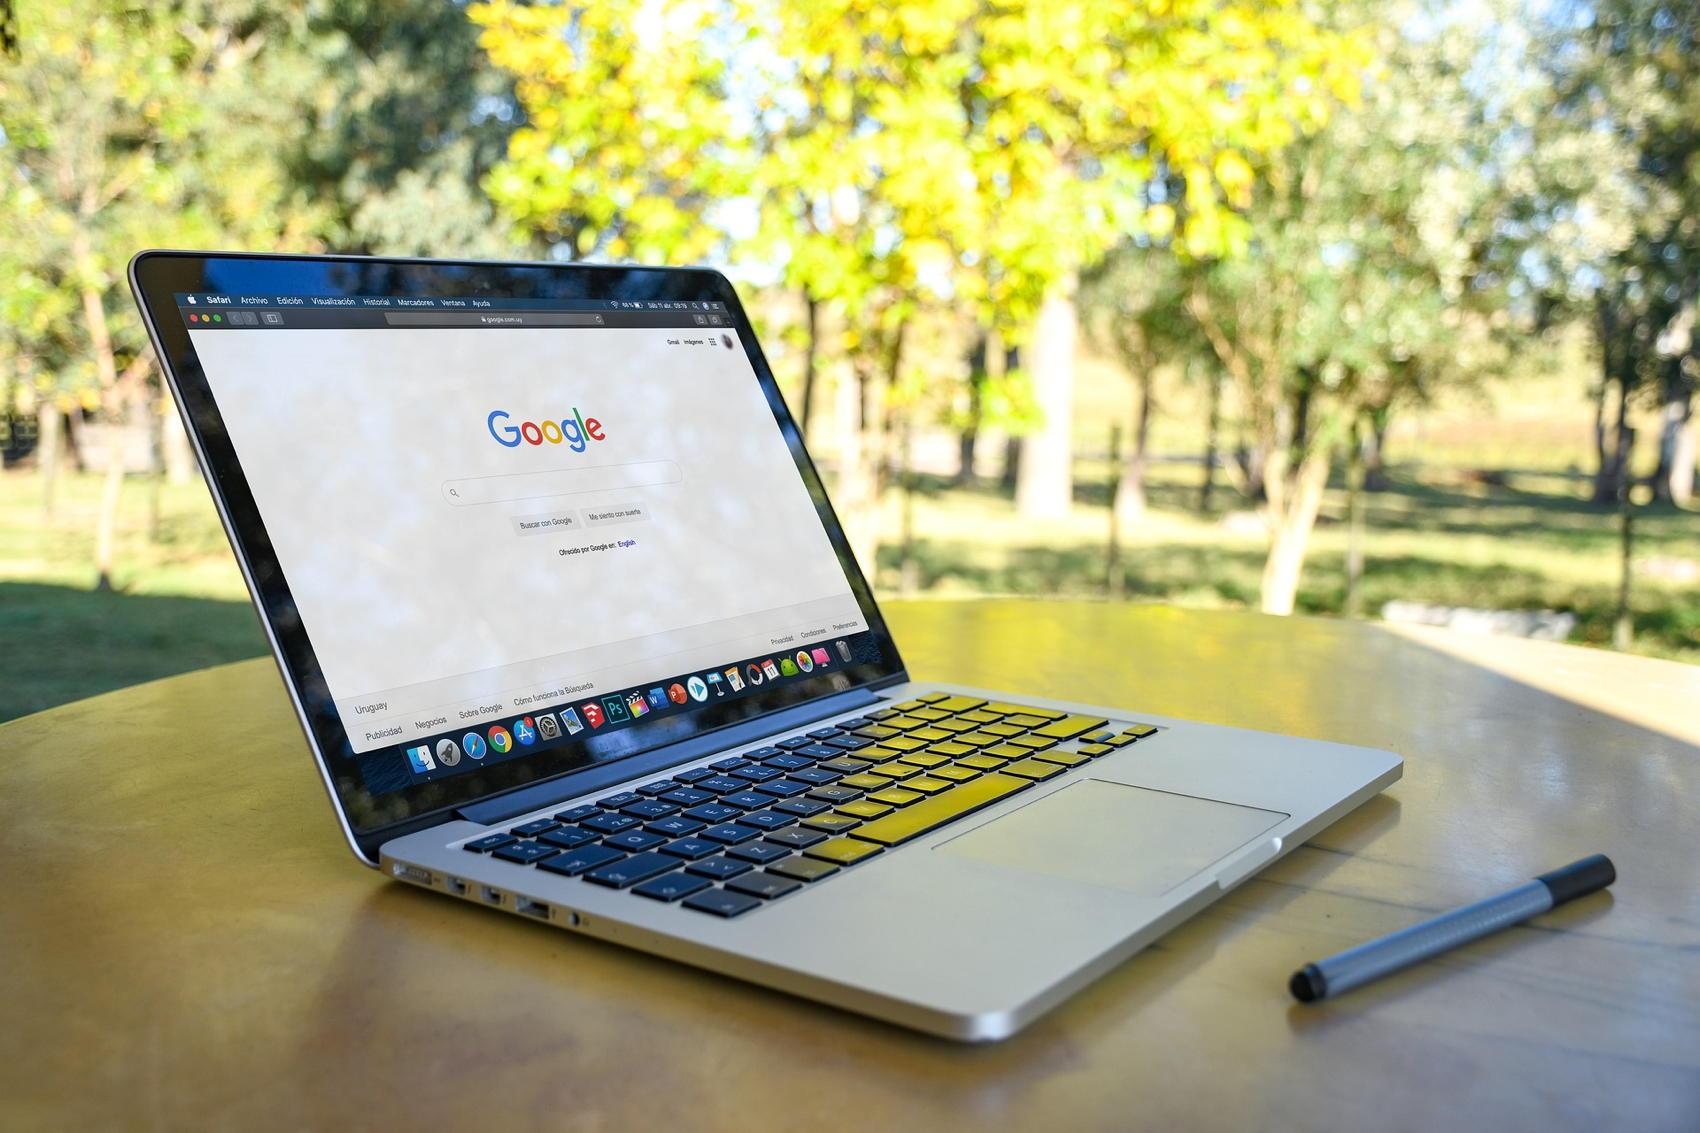 Google on MacBook - Image by Juan Francia